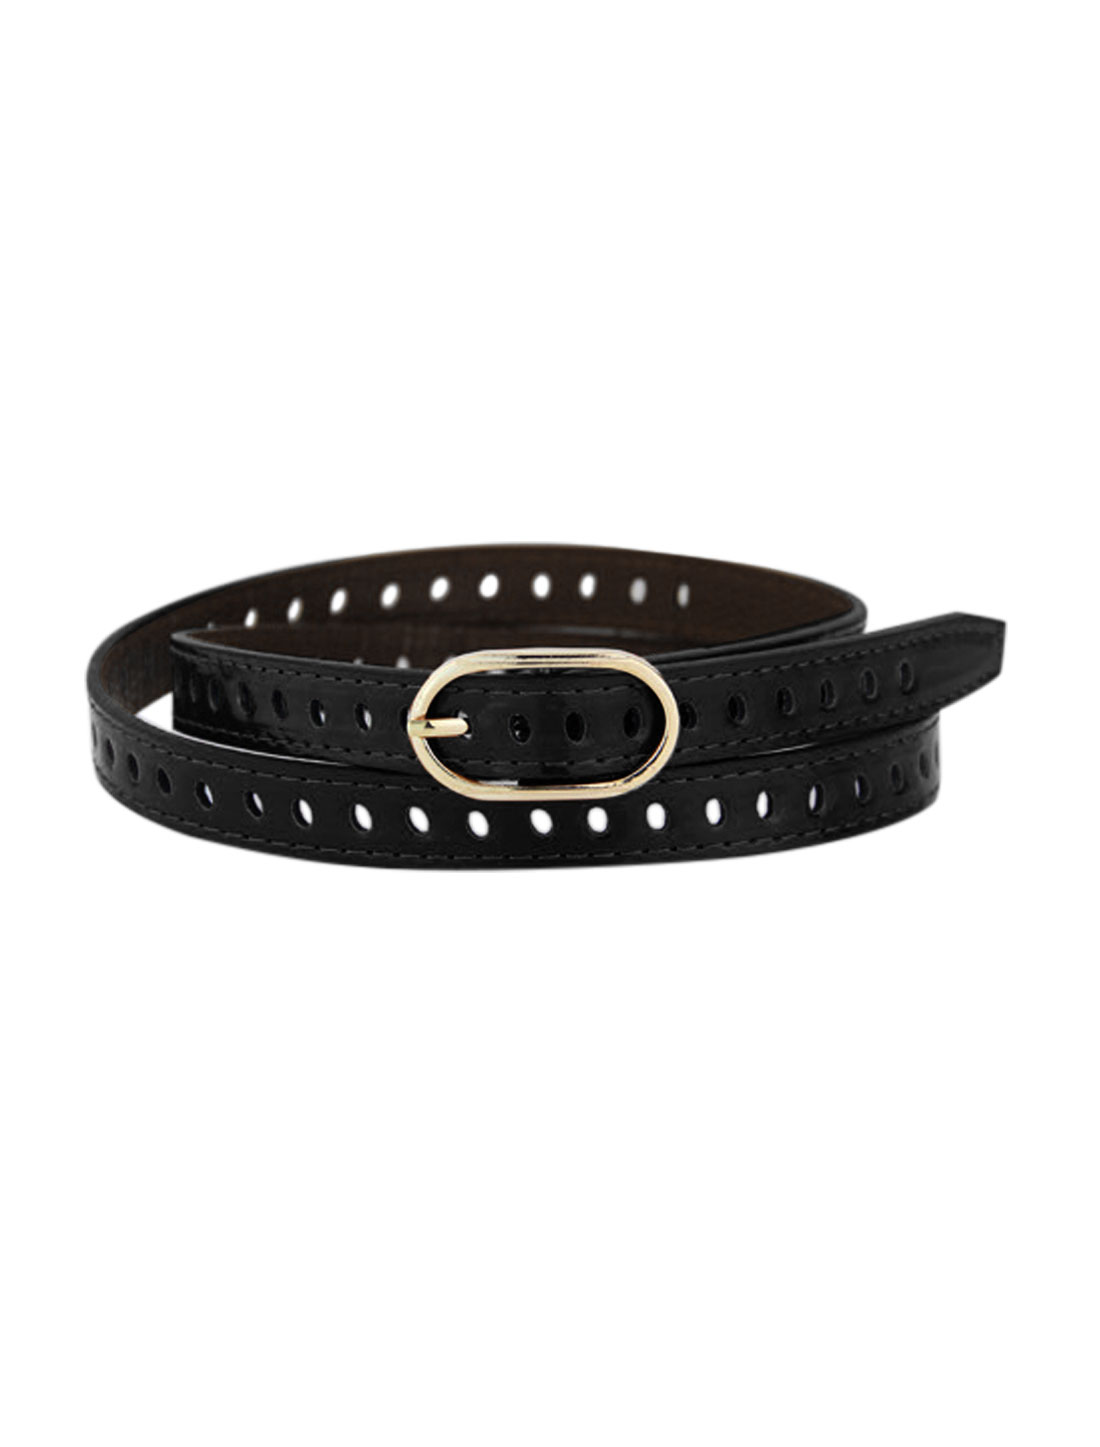 Women Adjustable Single Buckle Hollow Out PU Waist Belt Black